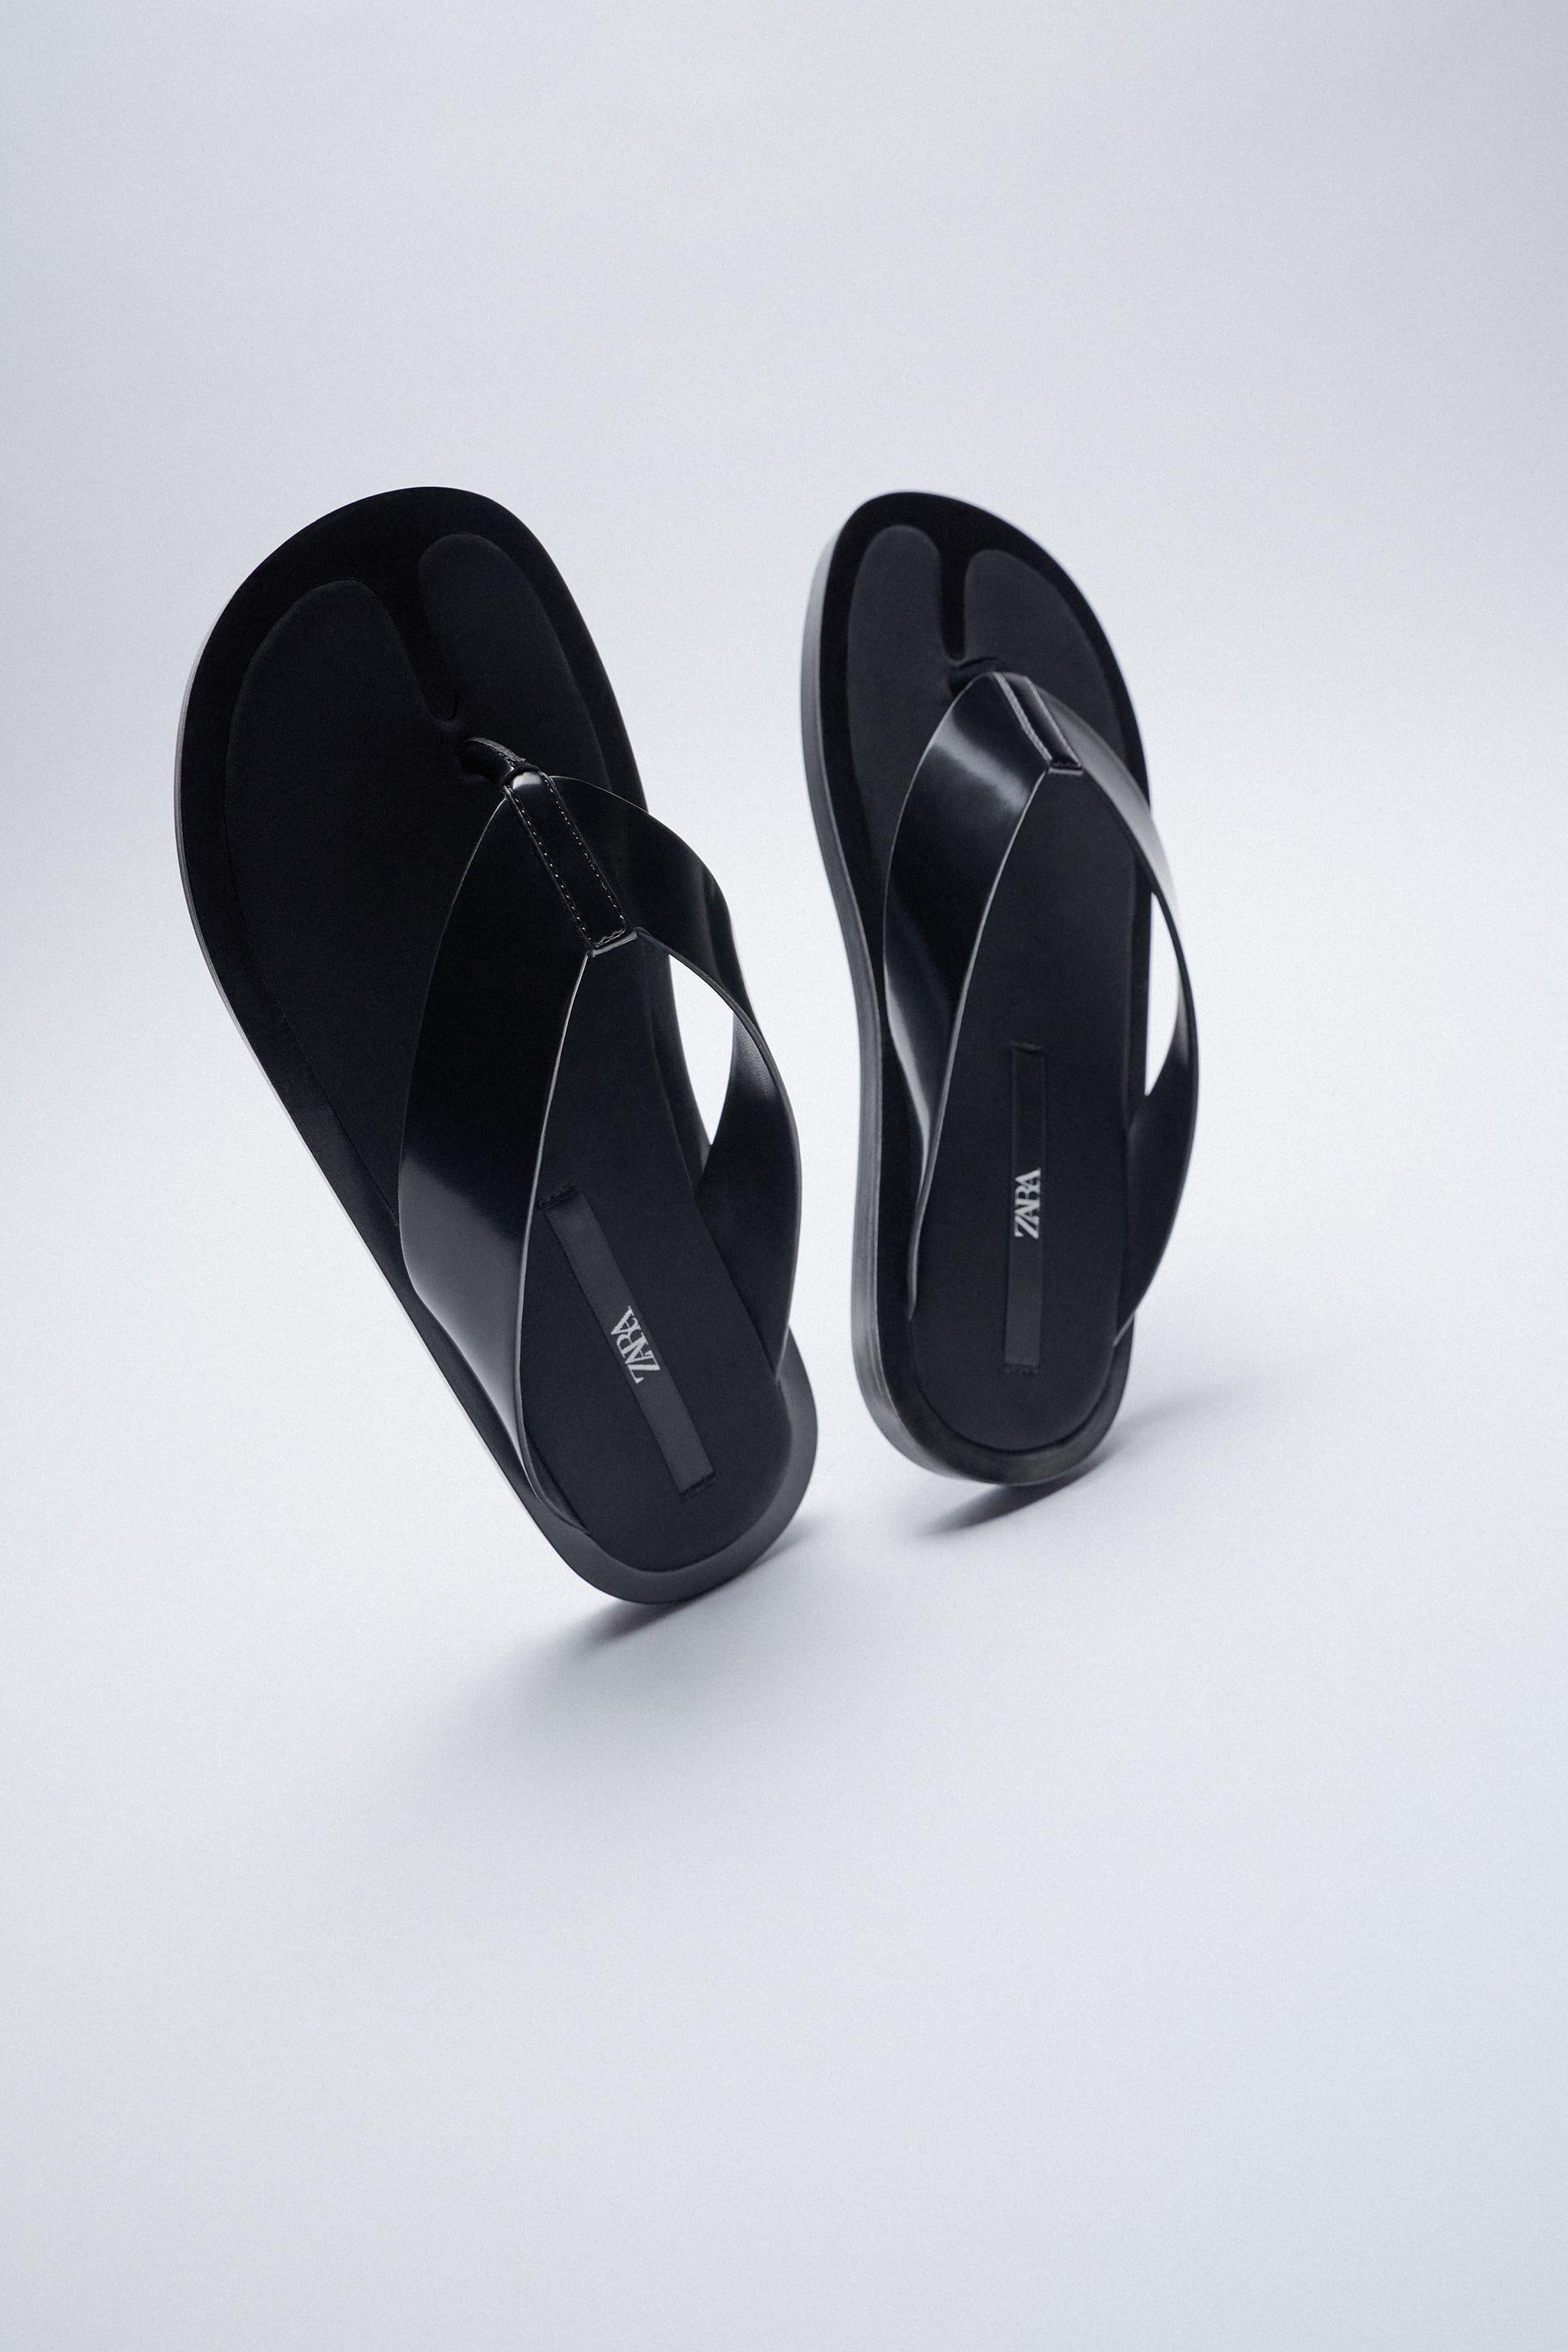 MINIMAL flatform FLAT SANDALS in black Zara